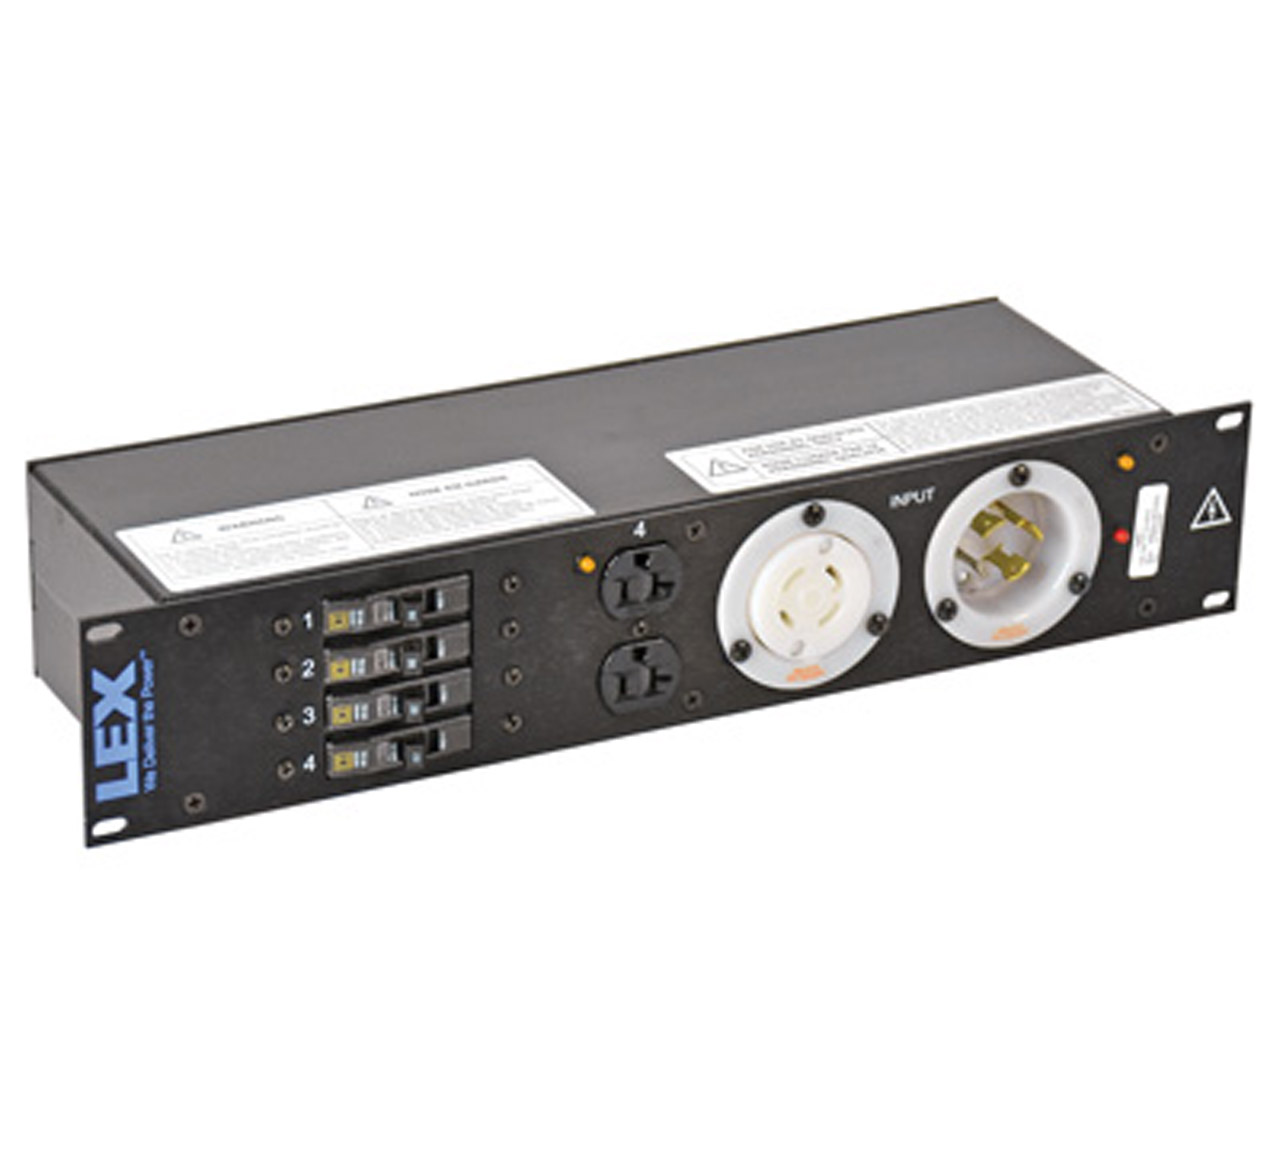 30 Amp 2RU Enclosed Rack, L14-30 to L5-30